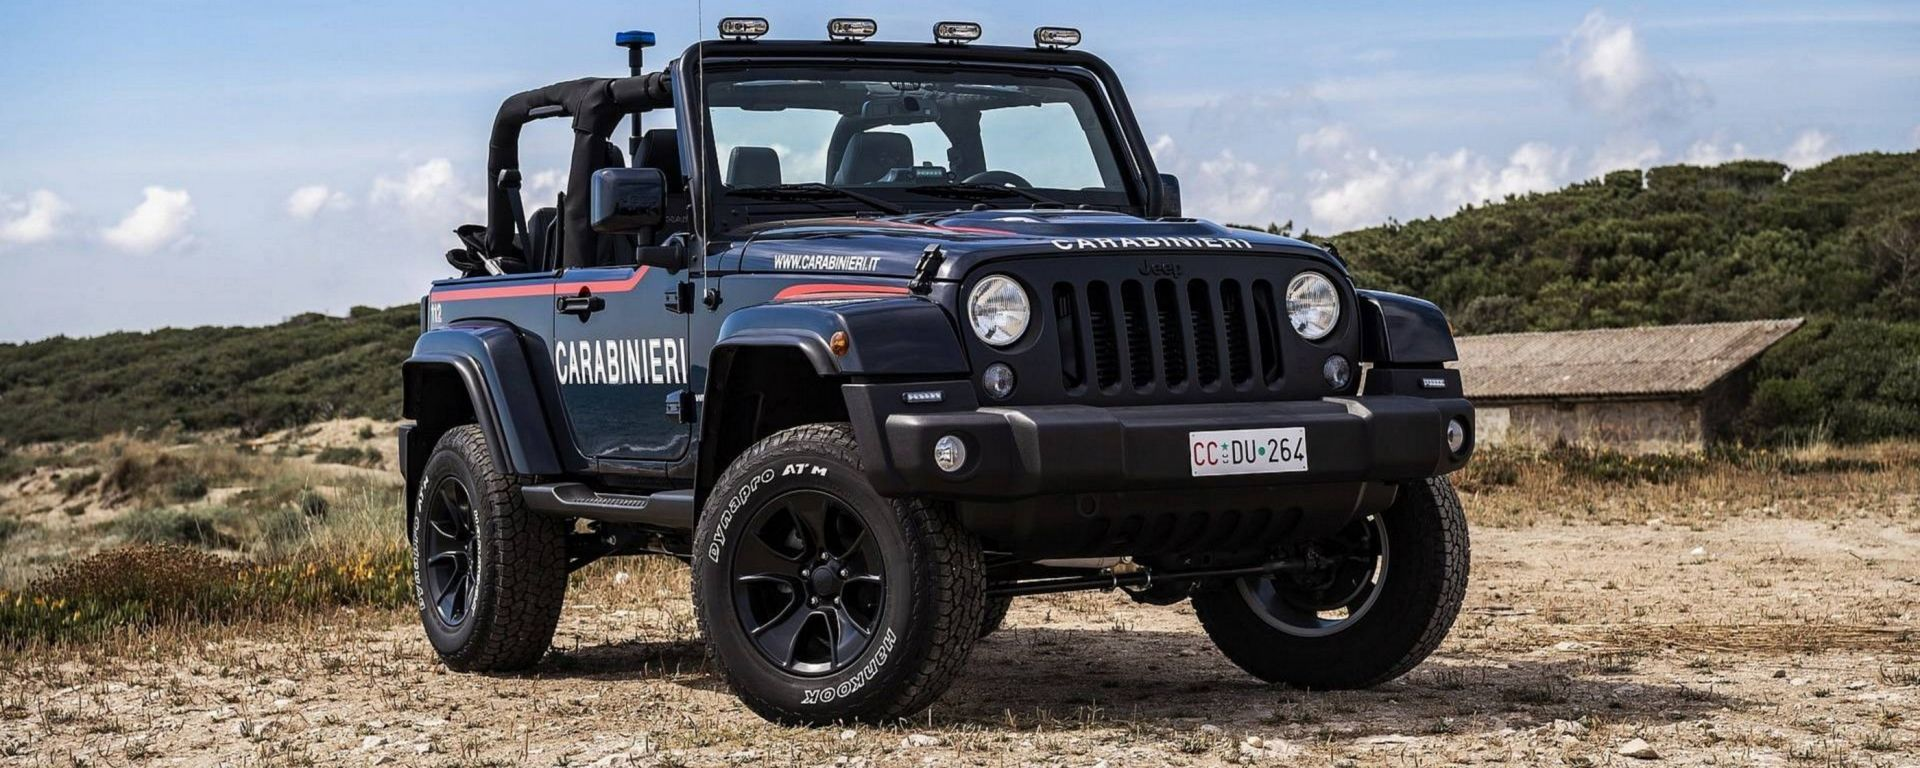 Jeep Wrangler: la nuova arma per i Carabinieri